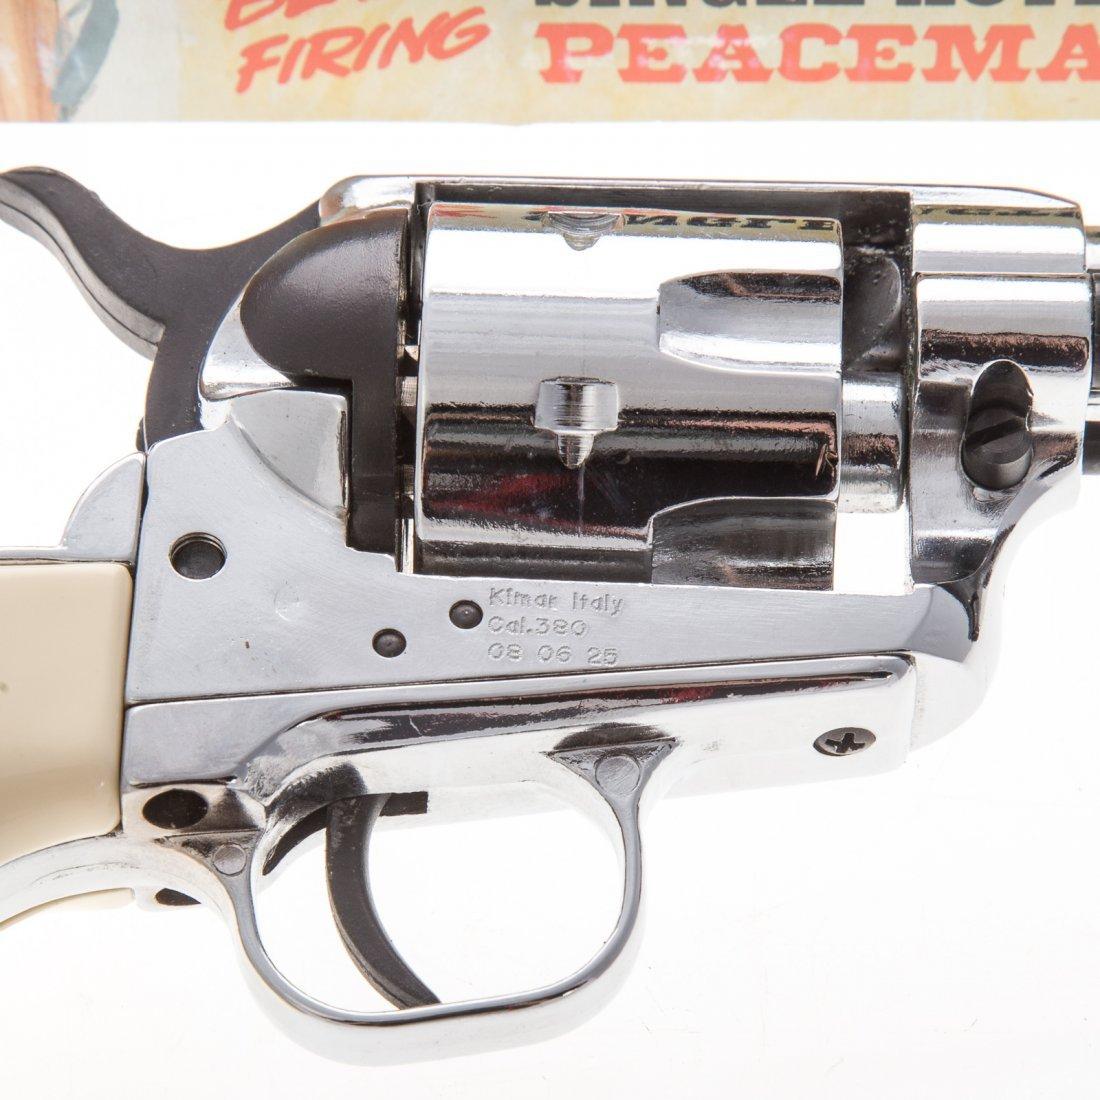 Kimar 380 caliber, model 1873 Peacemaker - 2